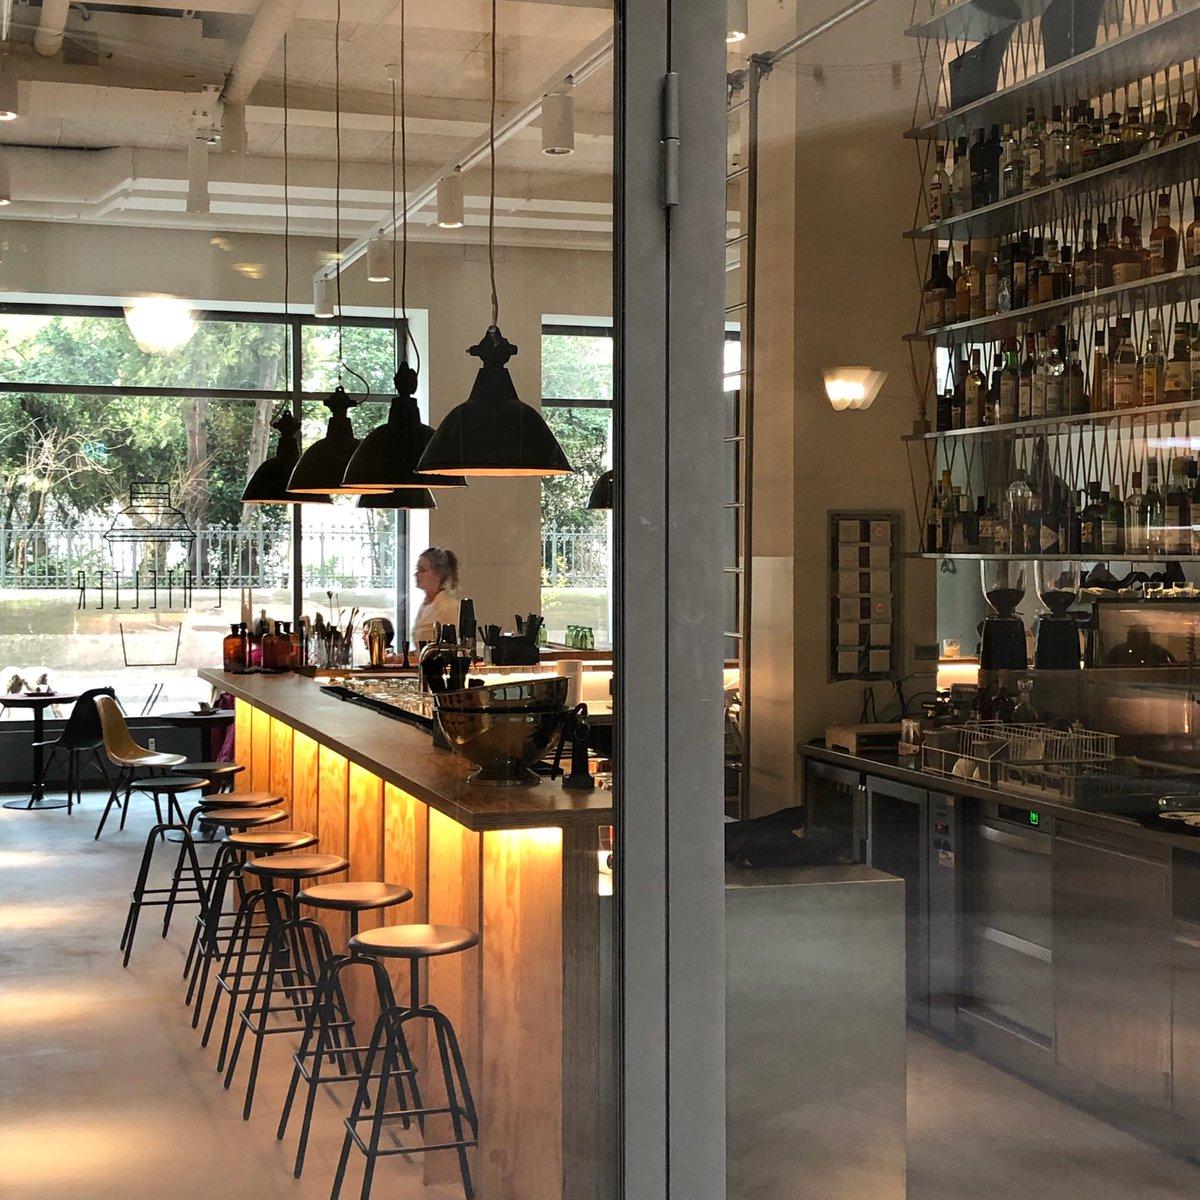 #newplacetobe #latelier #bar #bistro #cafe #nowopen #cosyplace #style #interiordesign #elisabethenstrasse #baselcity #ganzbasel #basellive